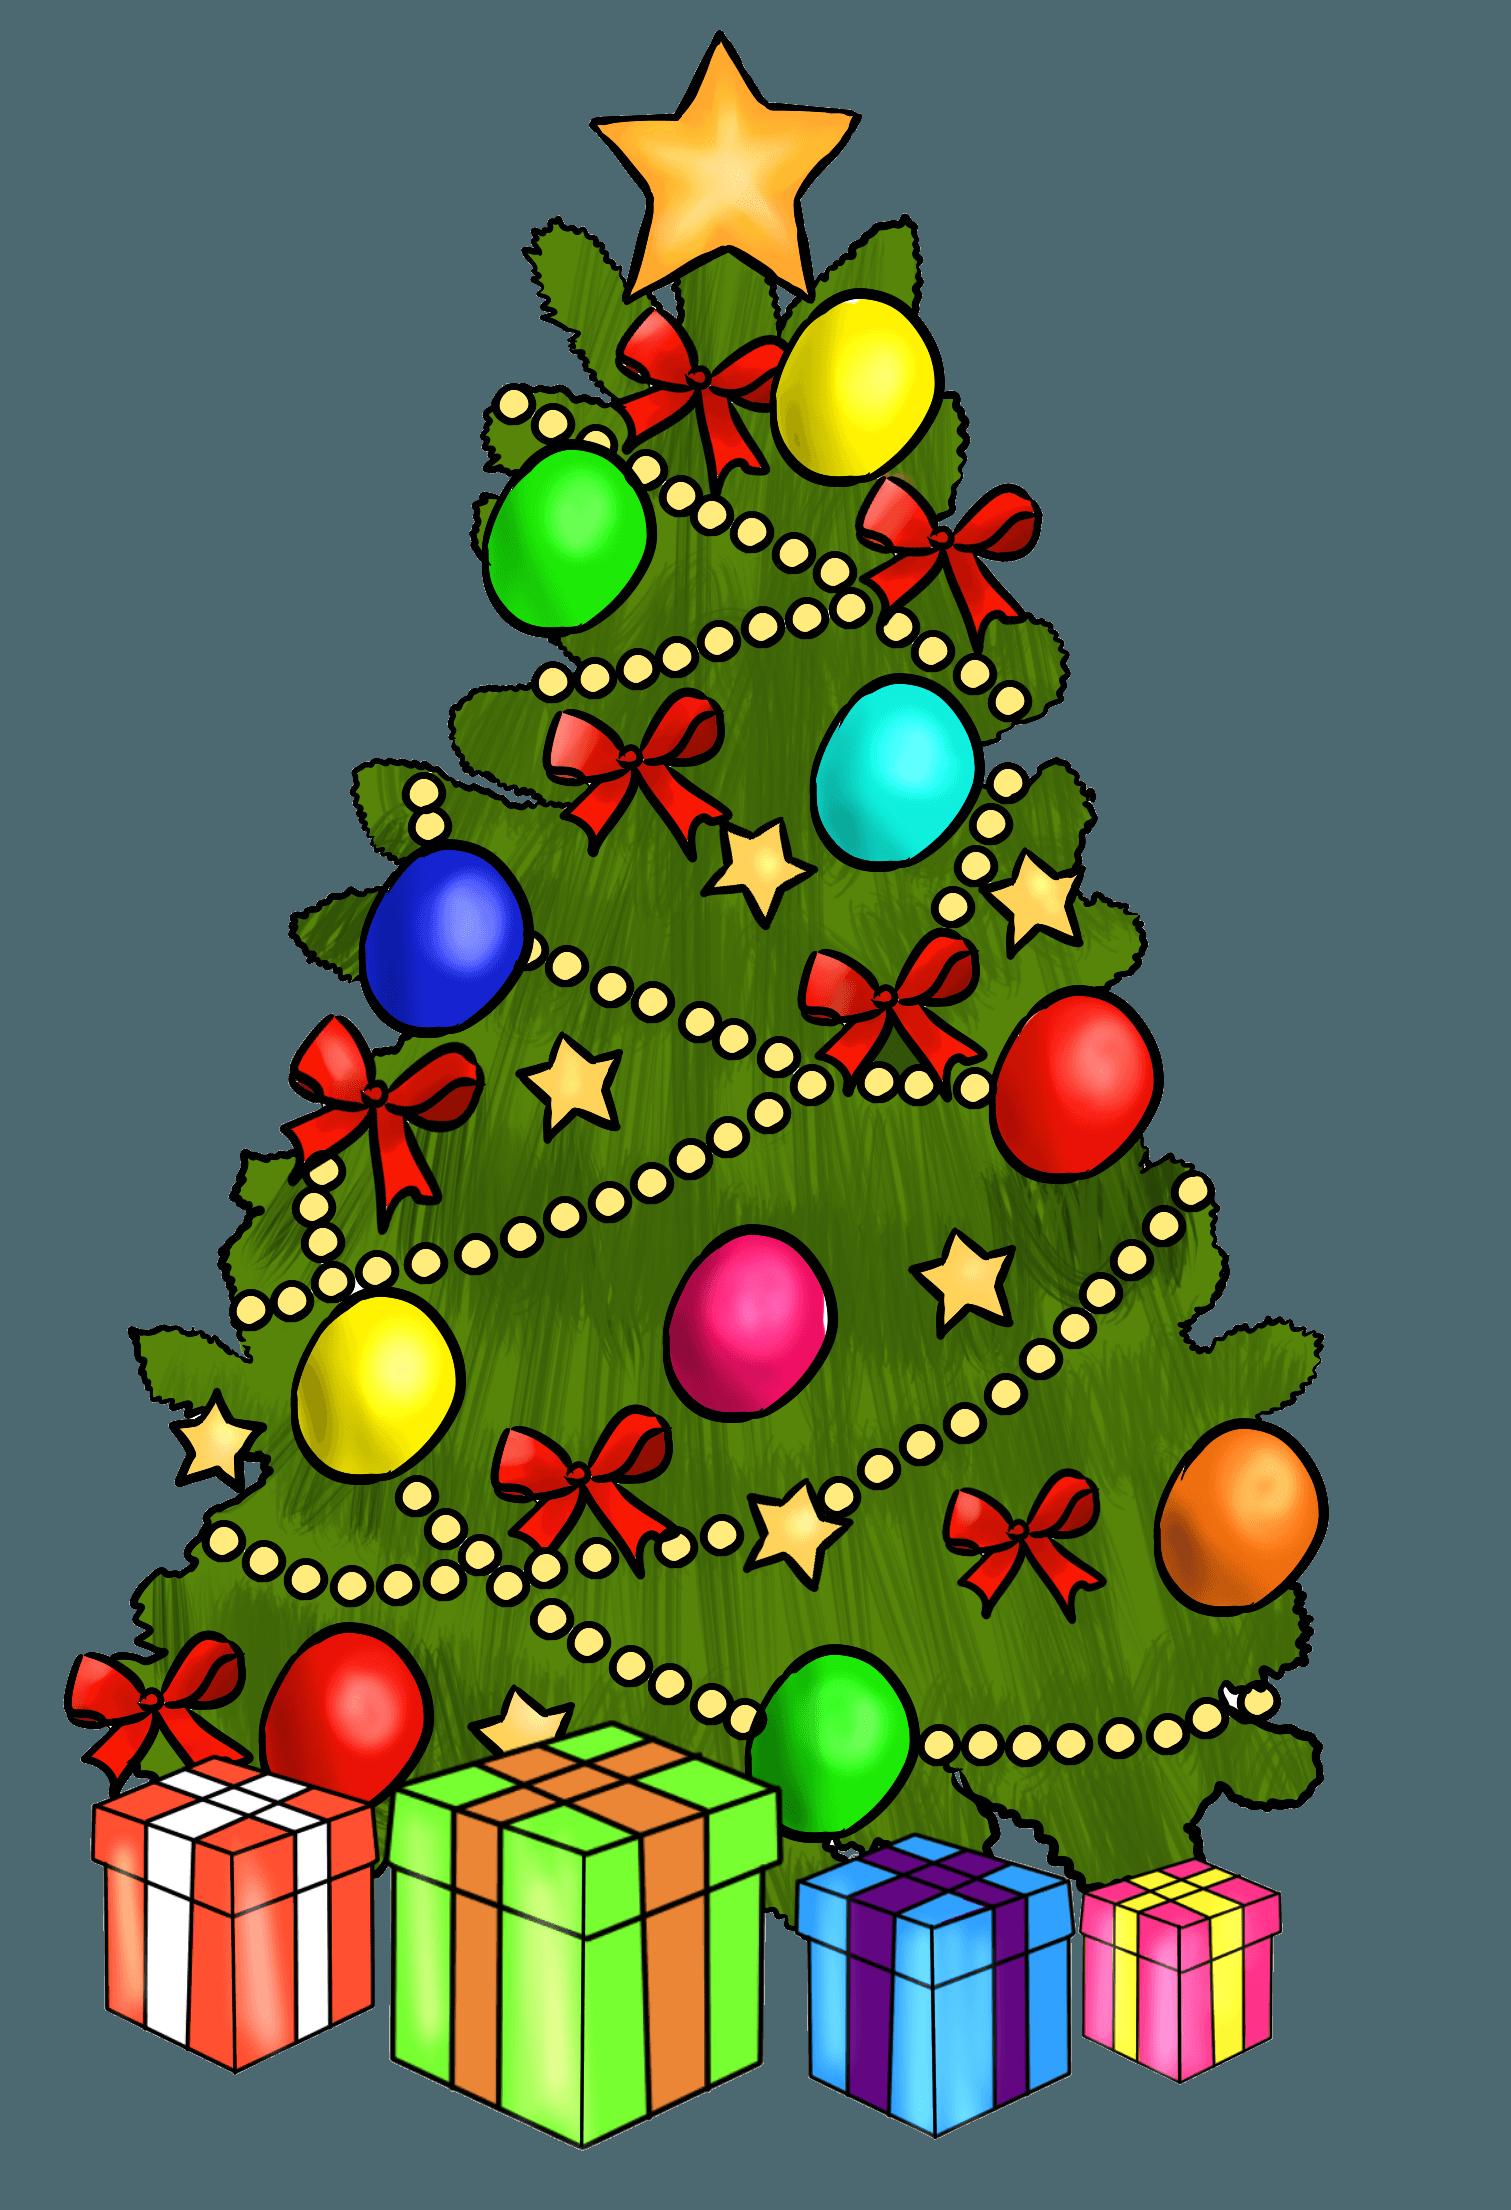 annual christmas tree lighting - Christmas Tree Removal